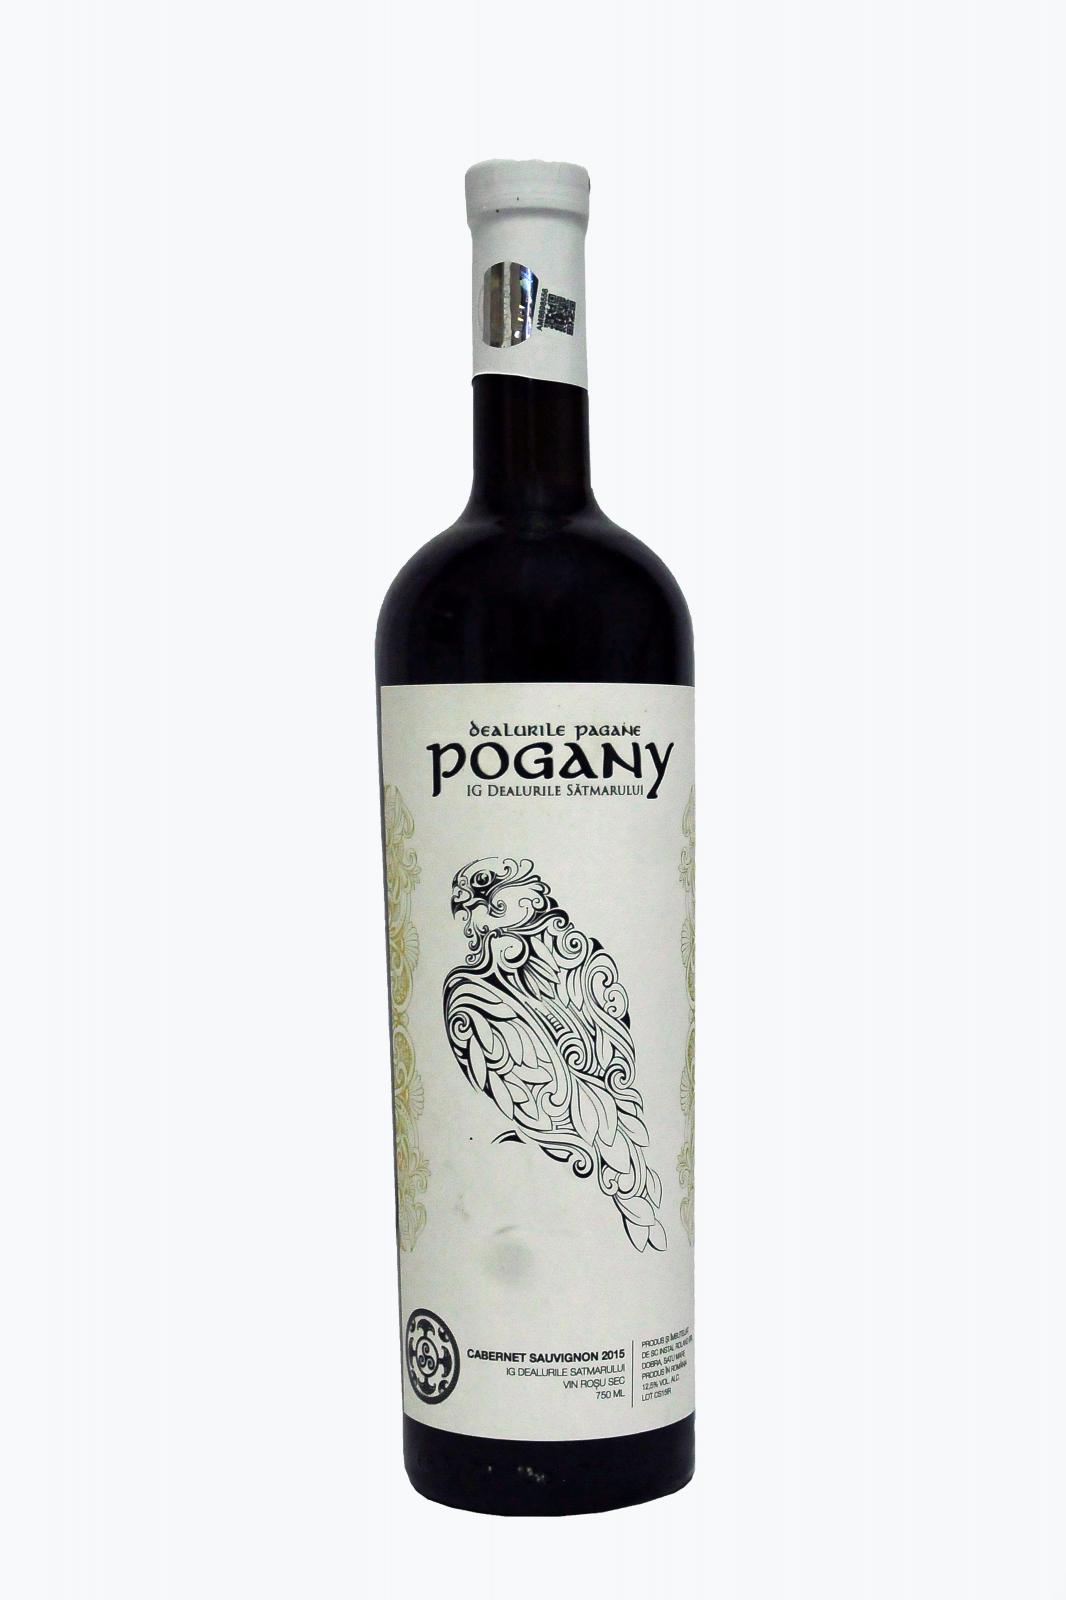 cabernet-sauvignon-2015-roșu-sec-8-9021.jpg